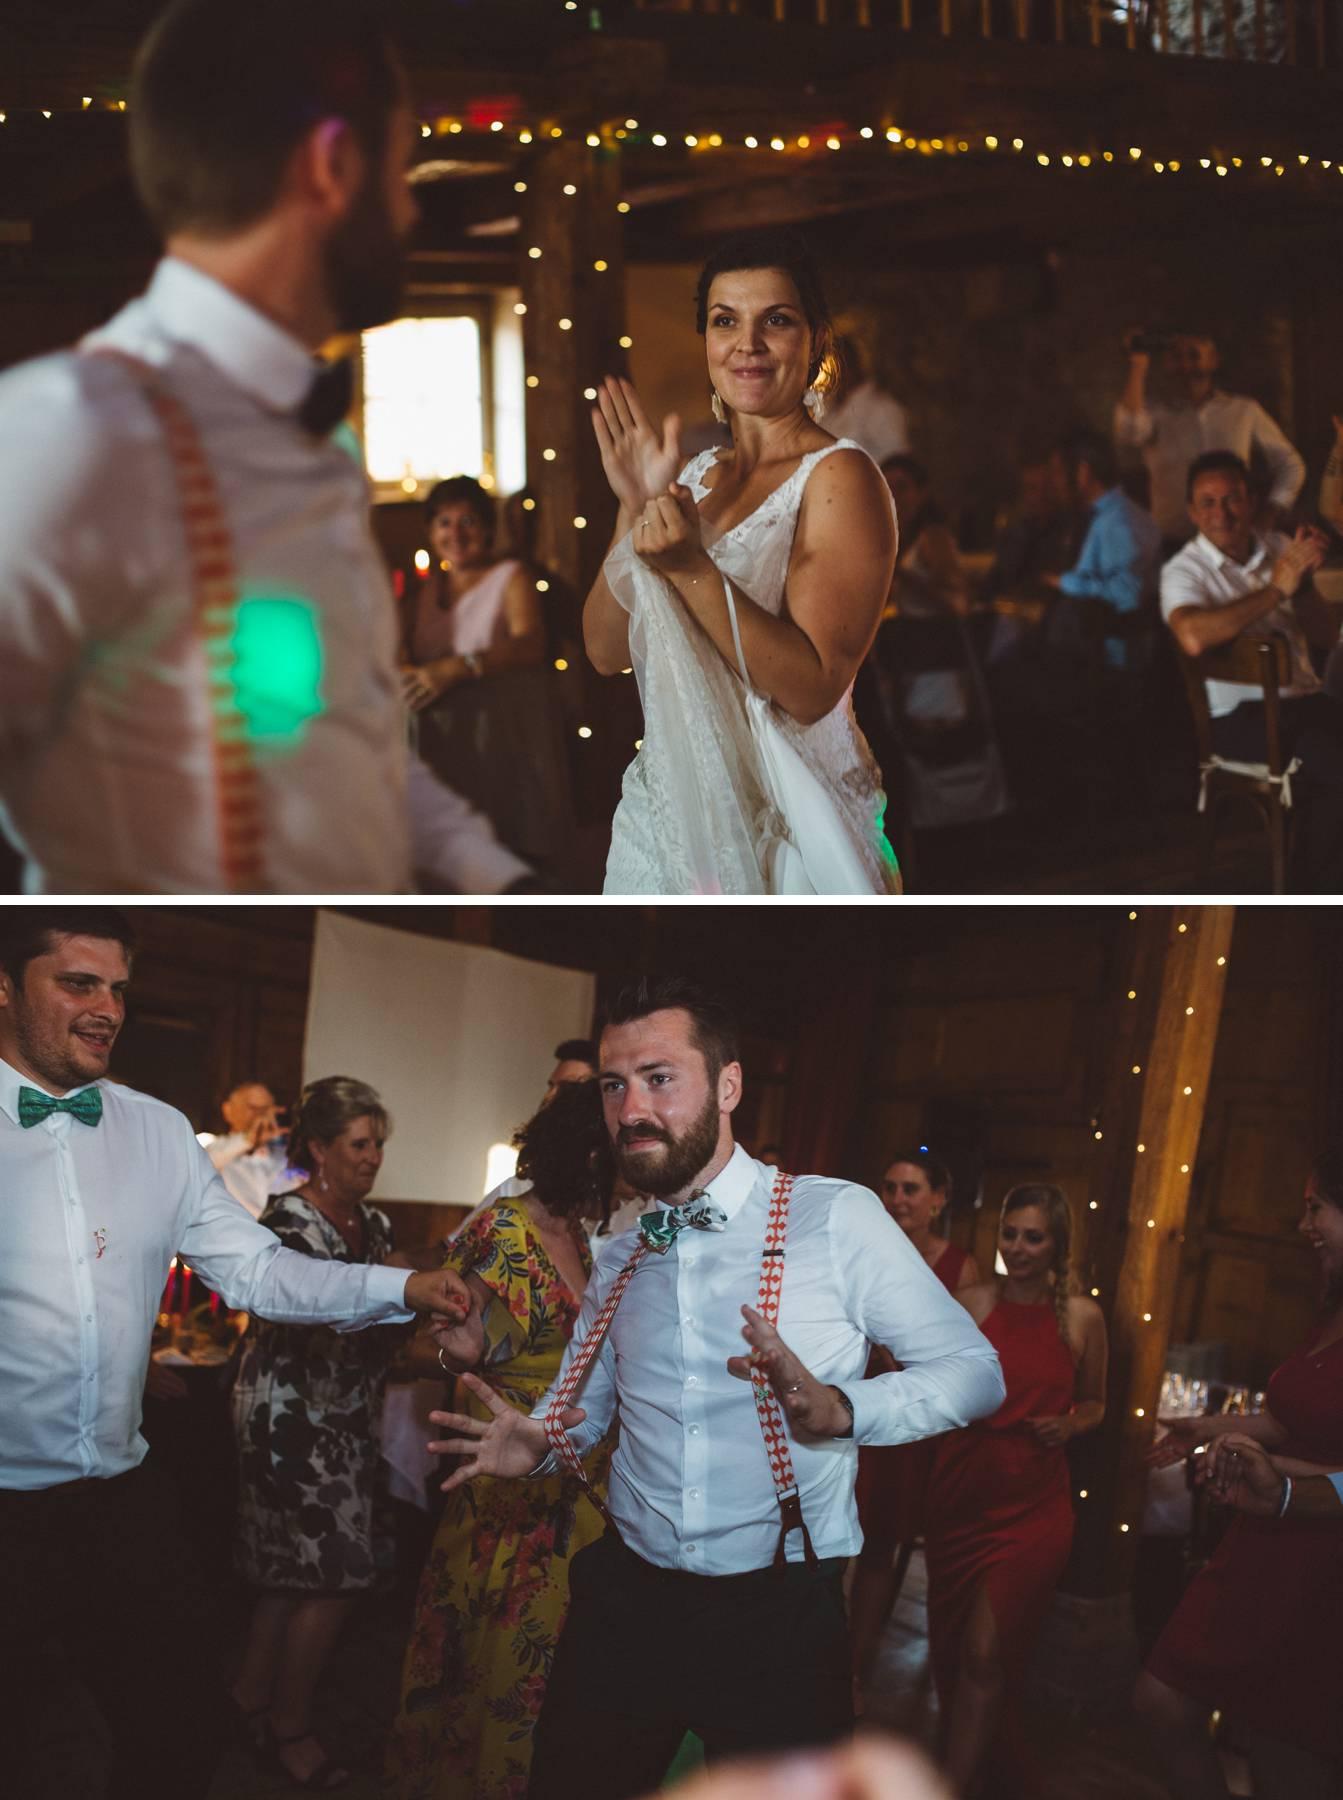 mariage-tropical-raben-horben_0030.jpg